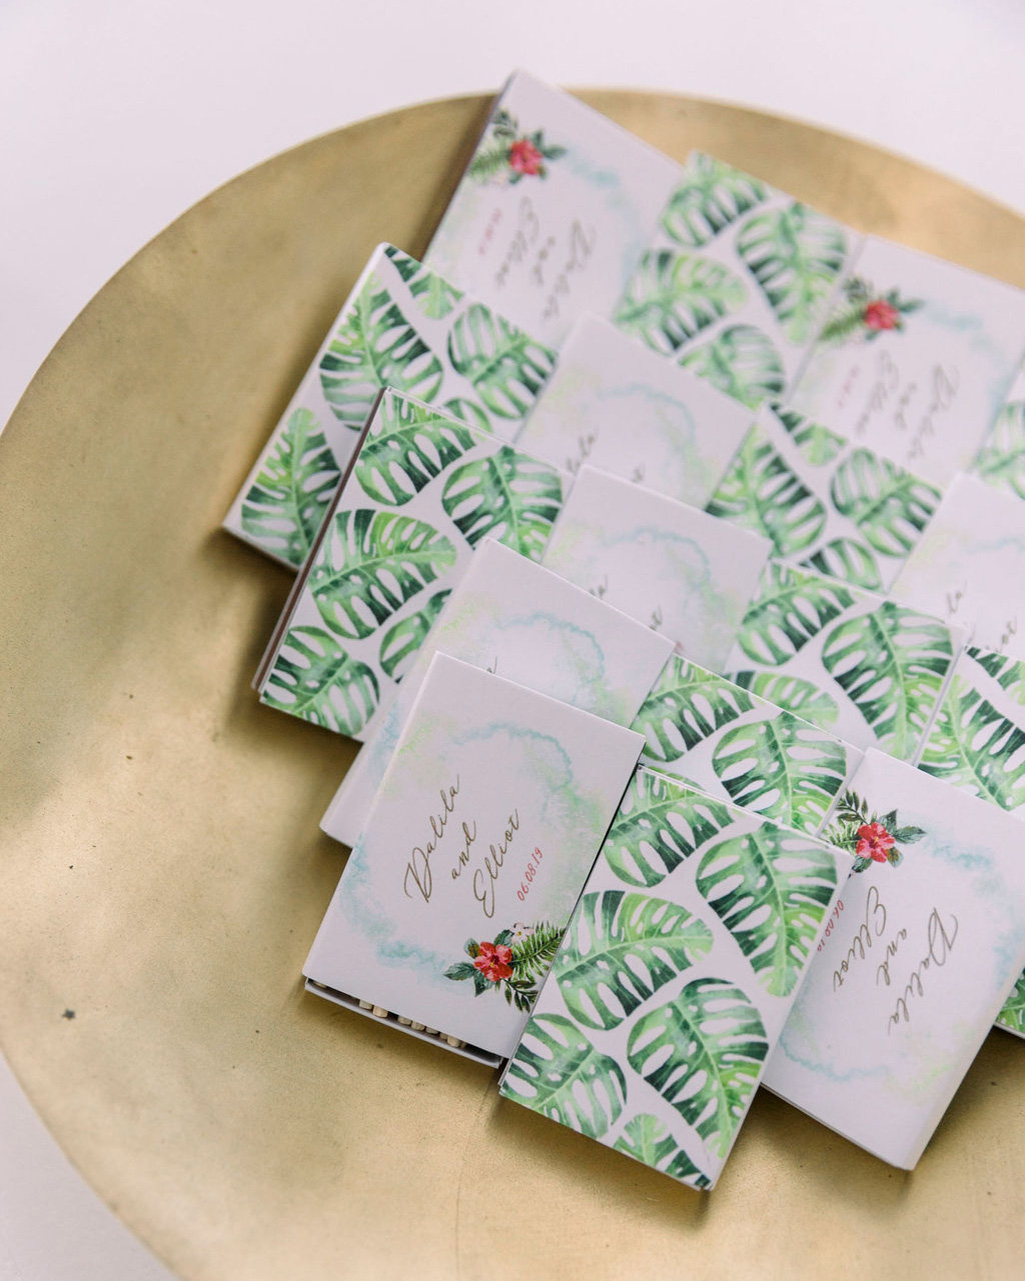 dalila elliot wedding programs with tropical designs